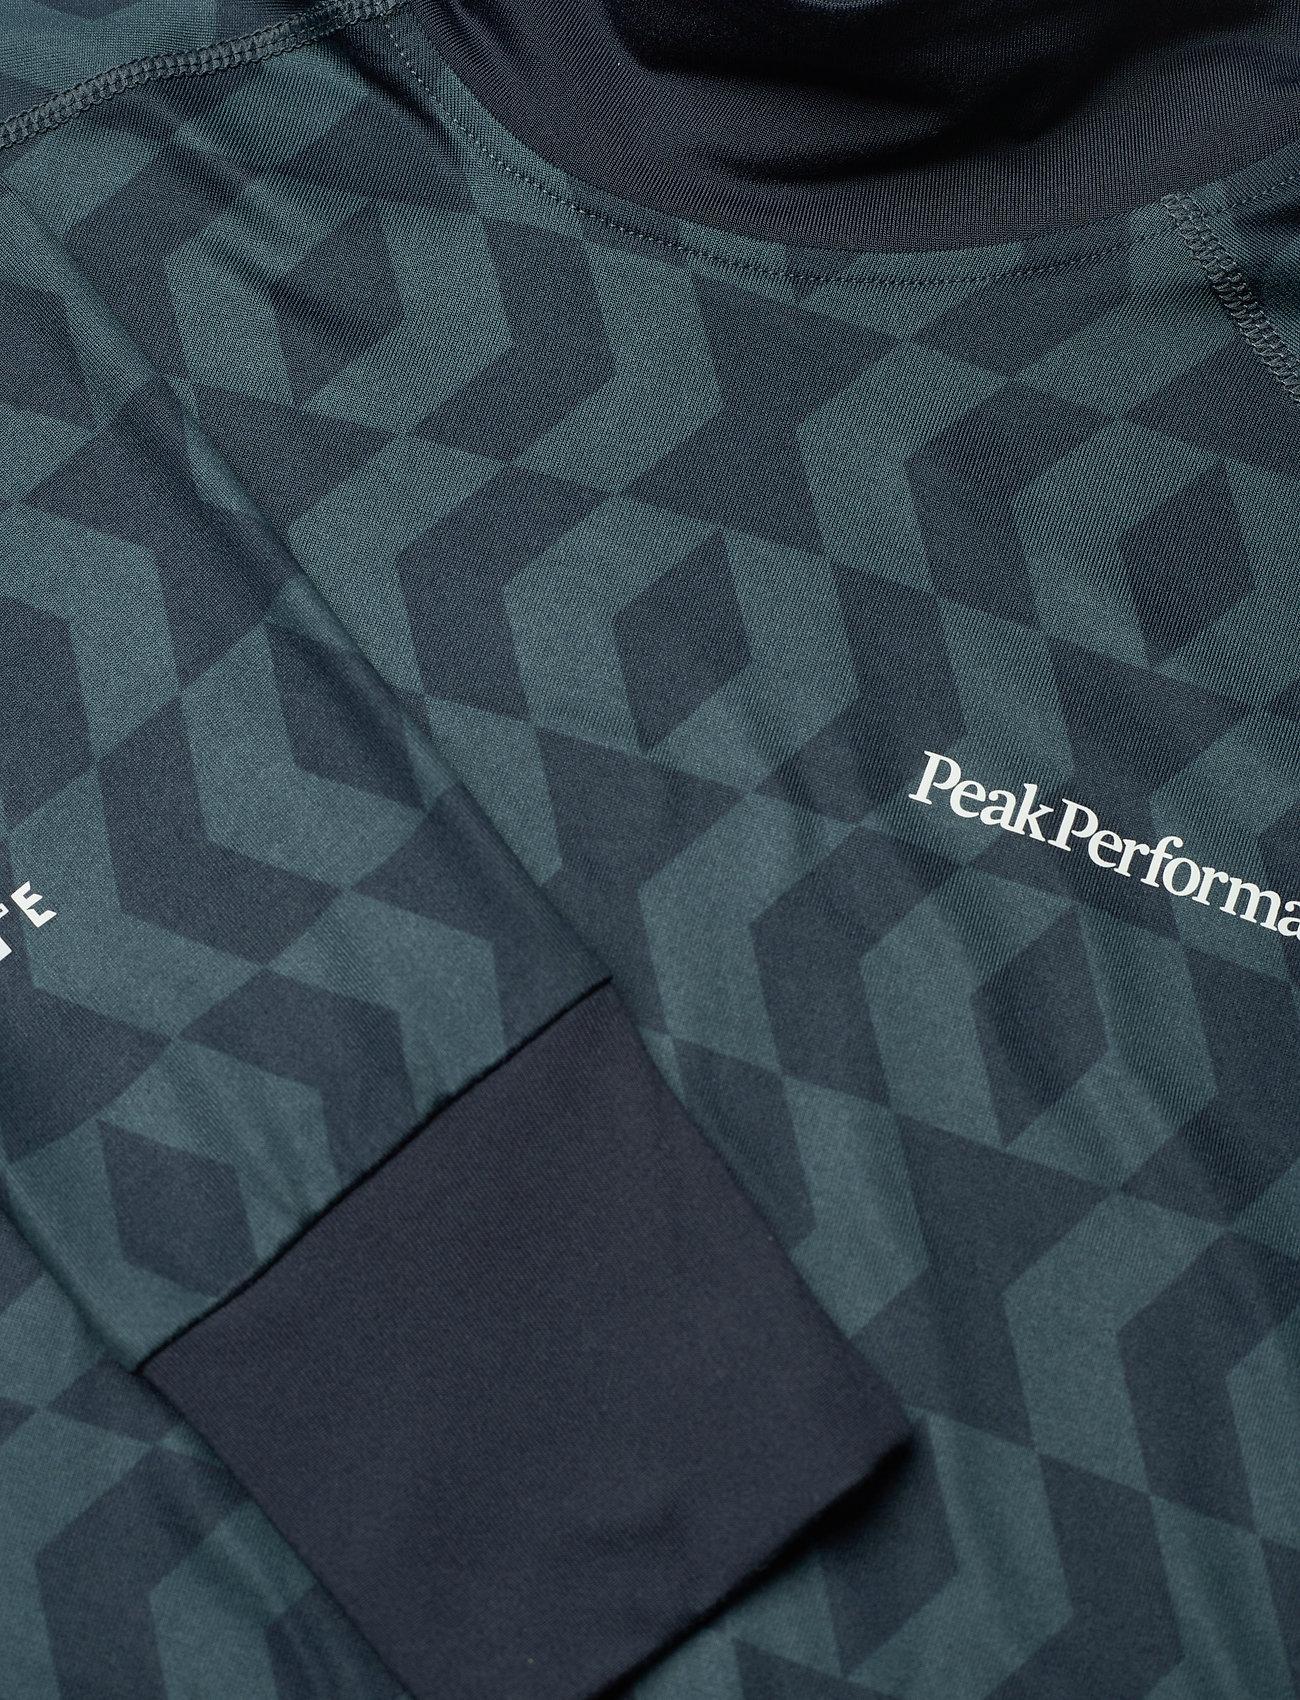 Junior Spirit Print Crew Pattern (Pattern) (40 €) - Peak Performance 67pkz